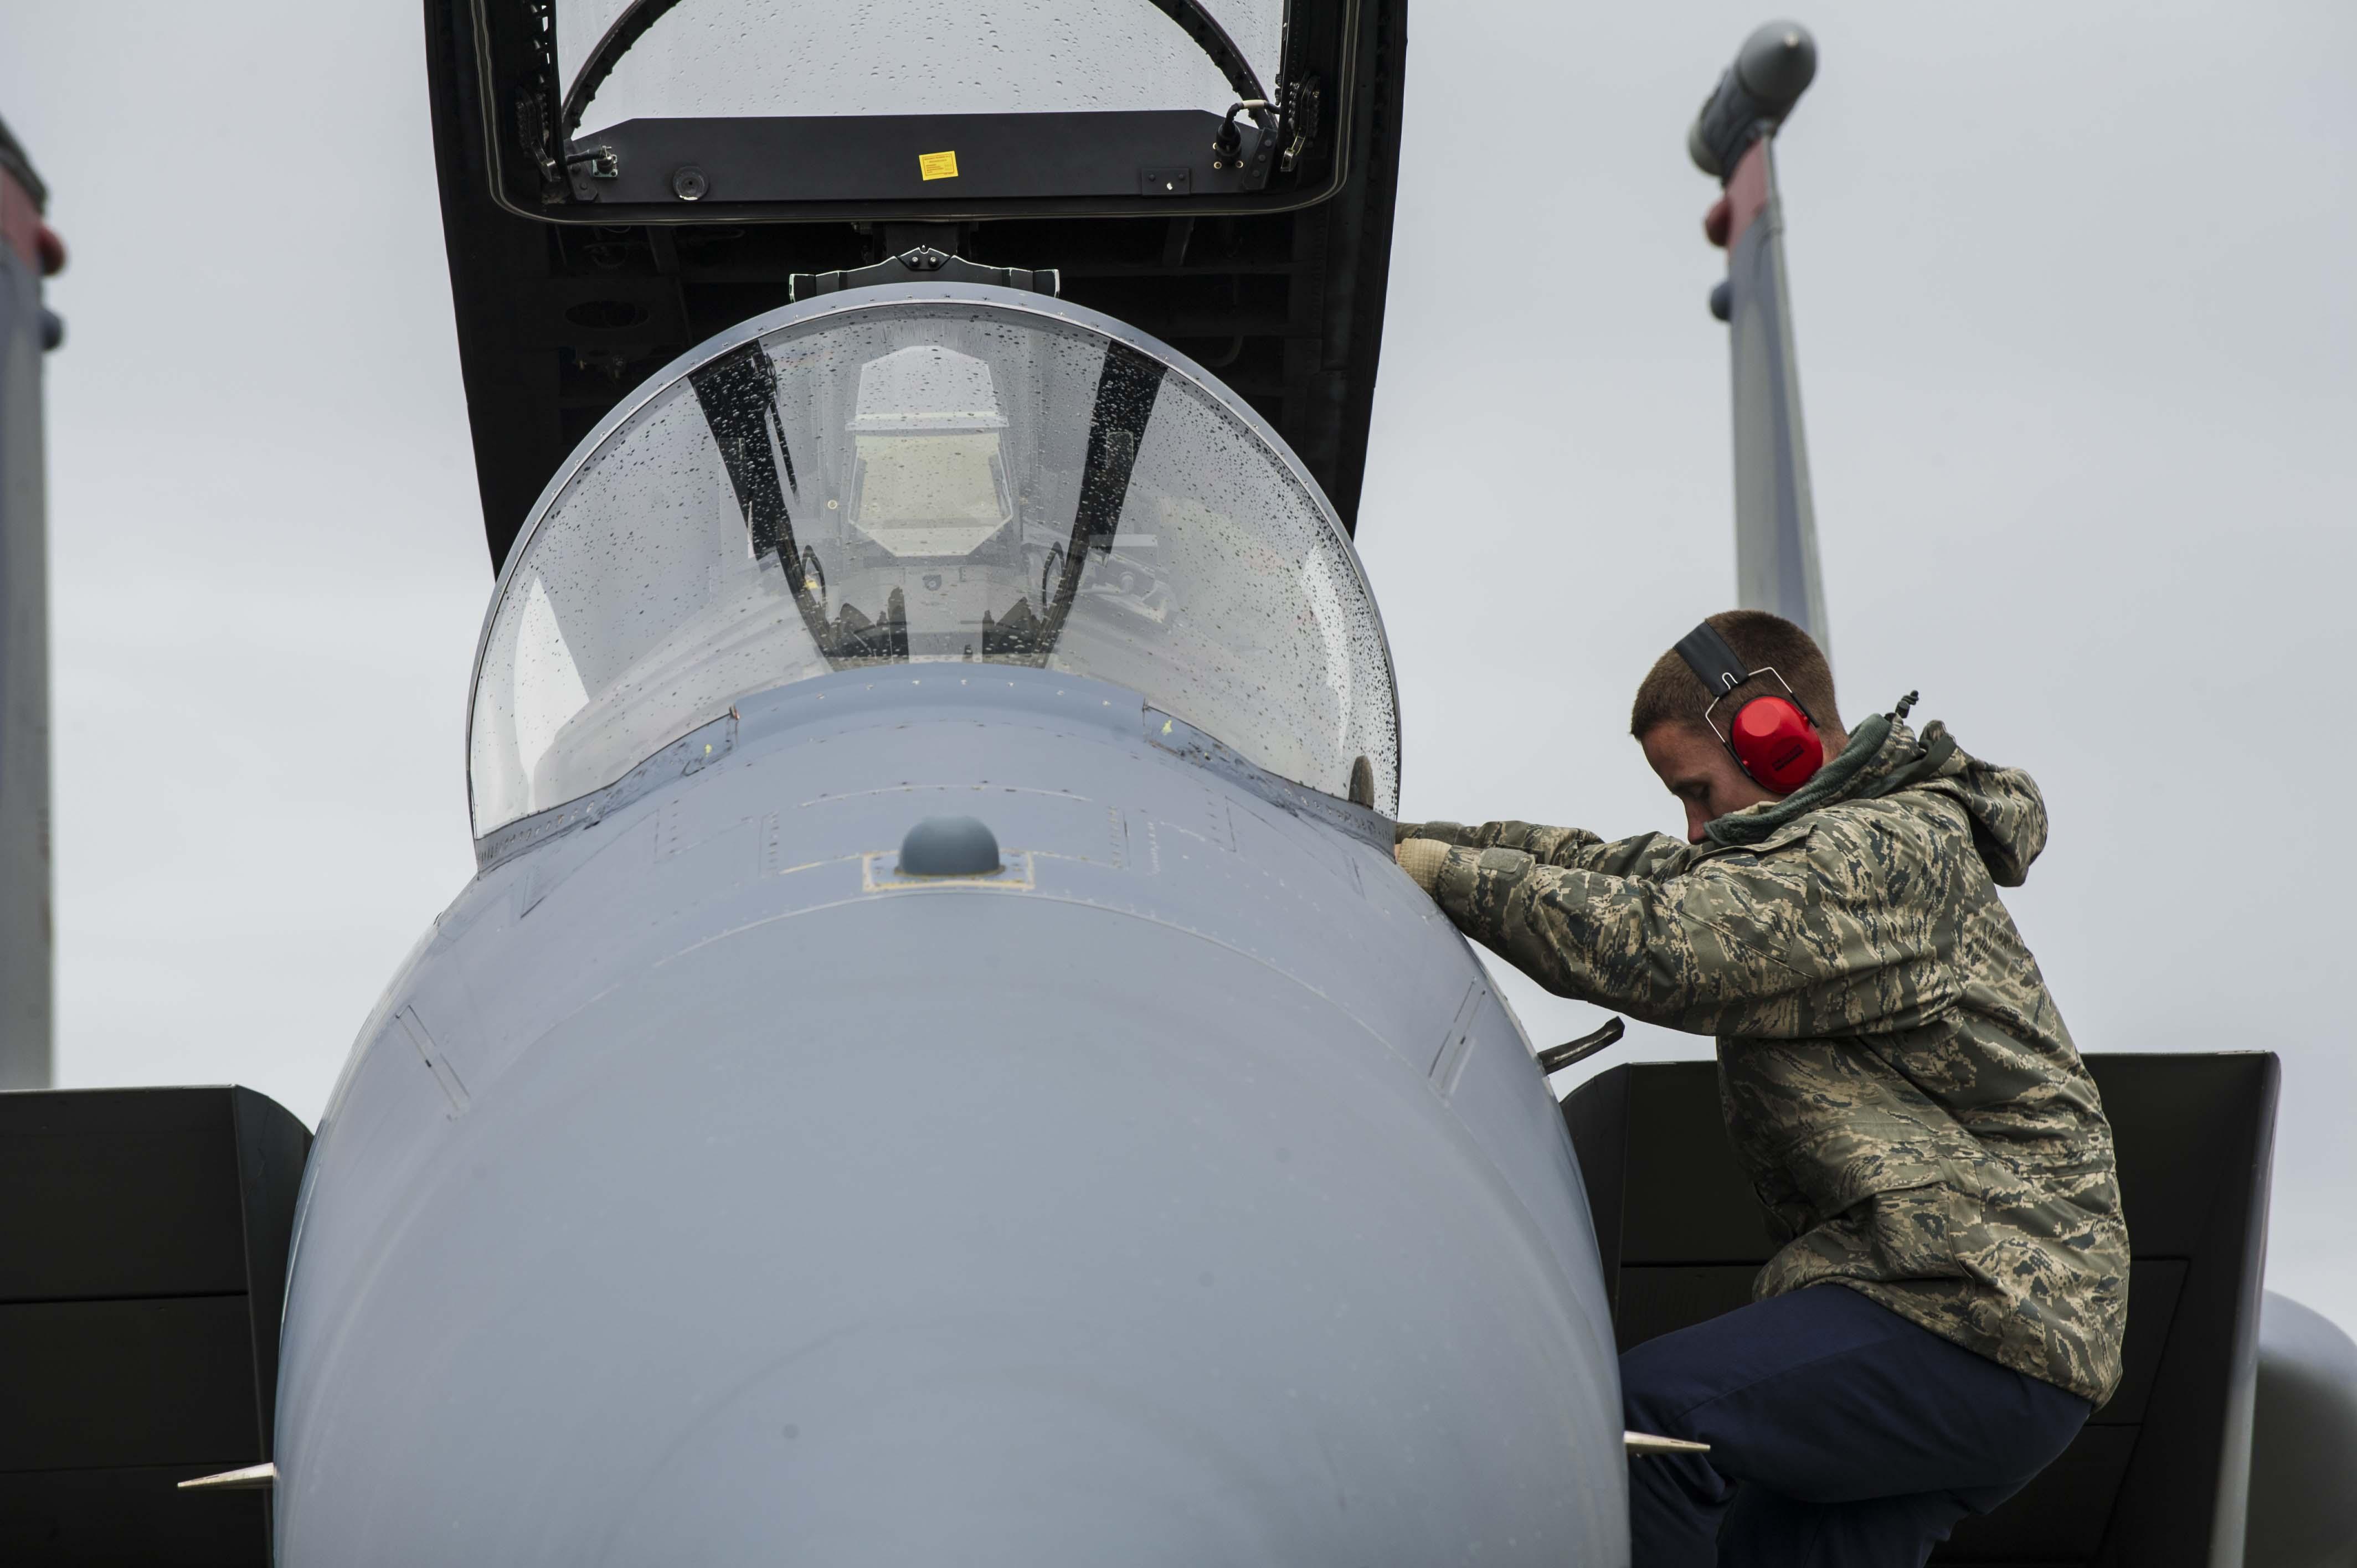 67th Aircraft Maintenance Unit kicks it into high gear